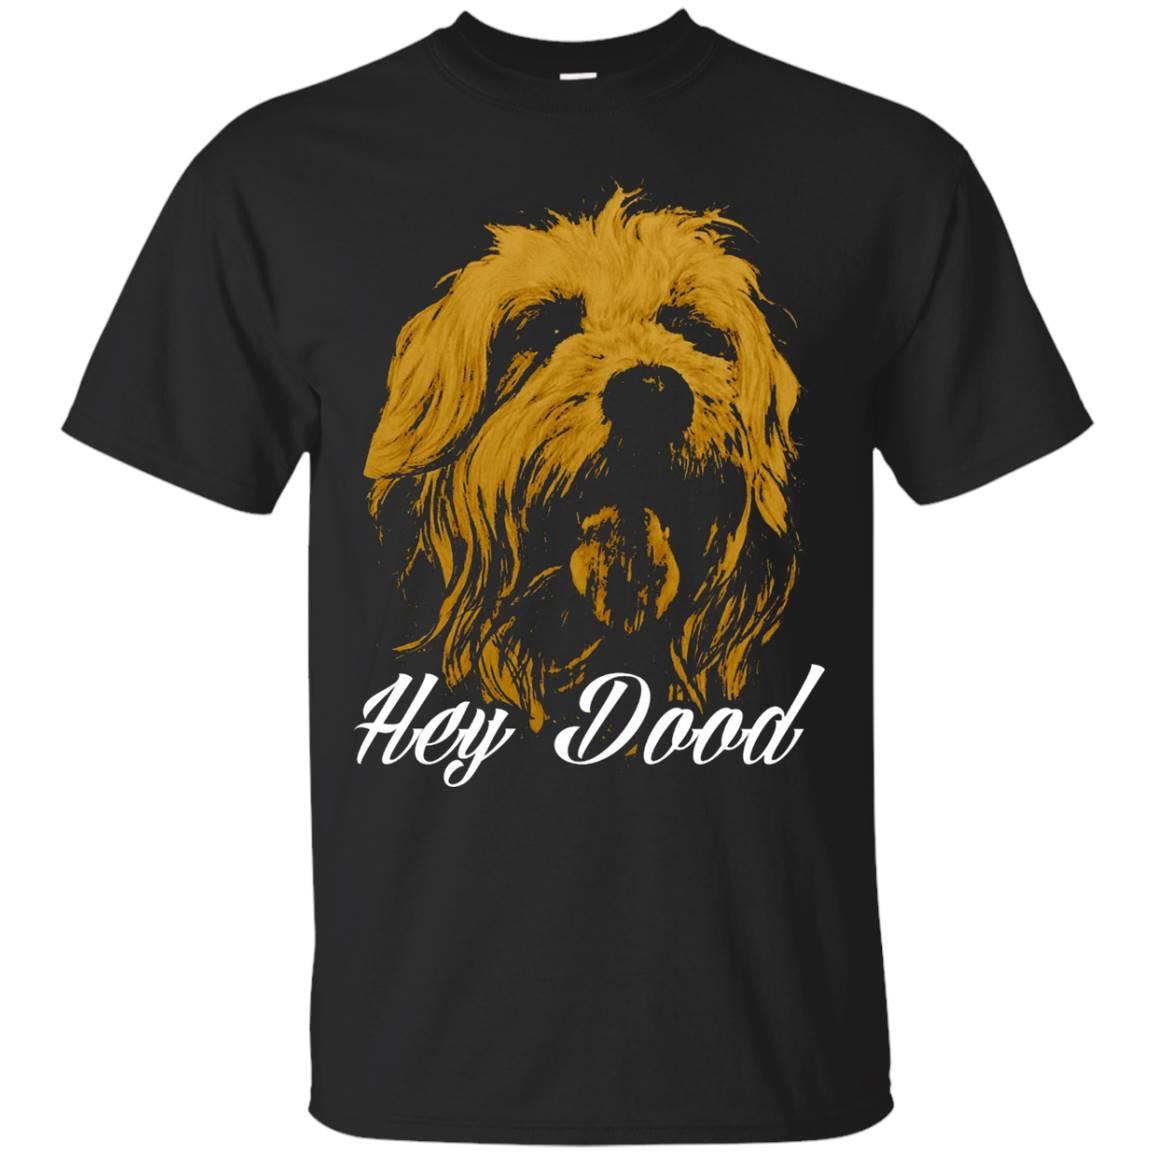 Hey Dood Awesome Goldendoodles Pet Dog Lover Gift T-Shirt